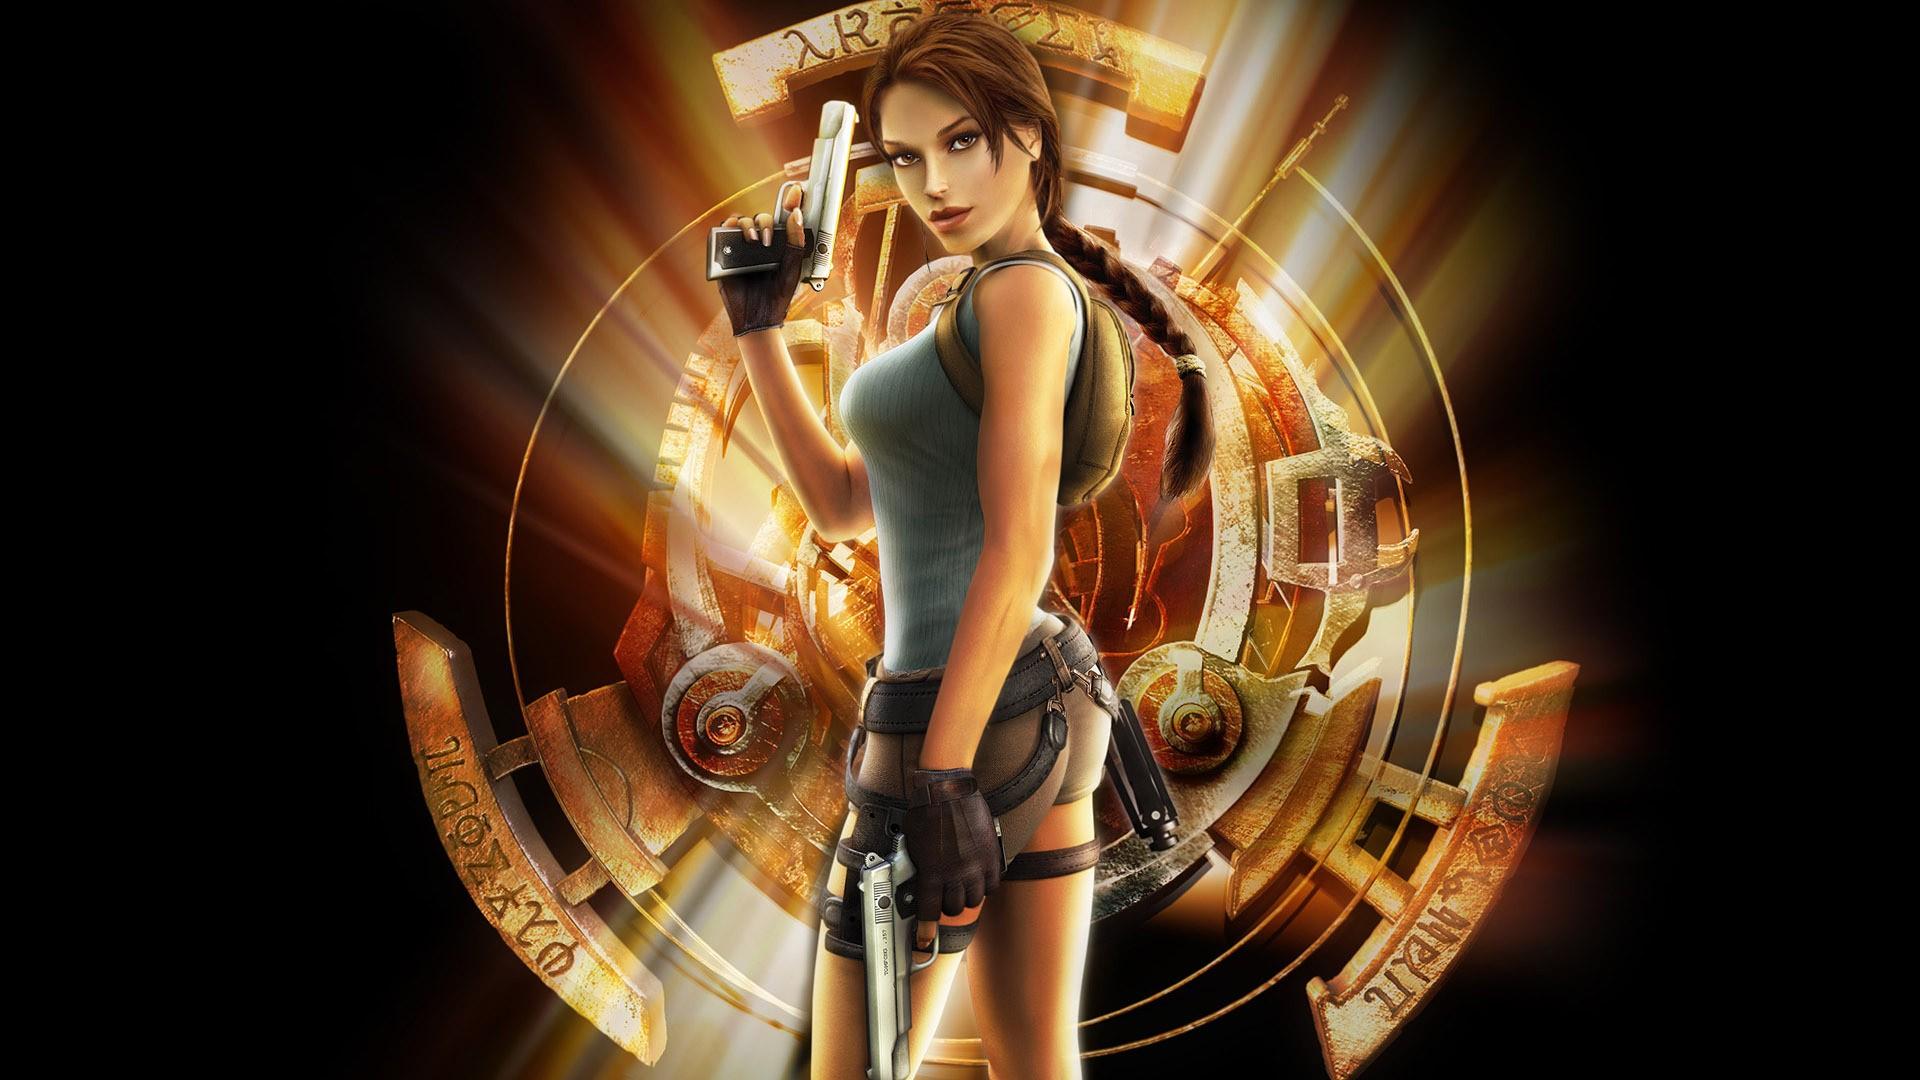 Lara Croft Wallpaper Download Free Beautiful Backgrounds For